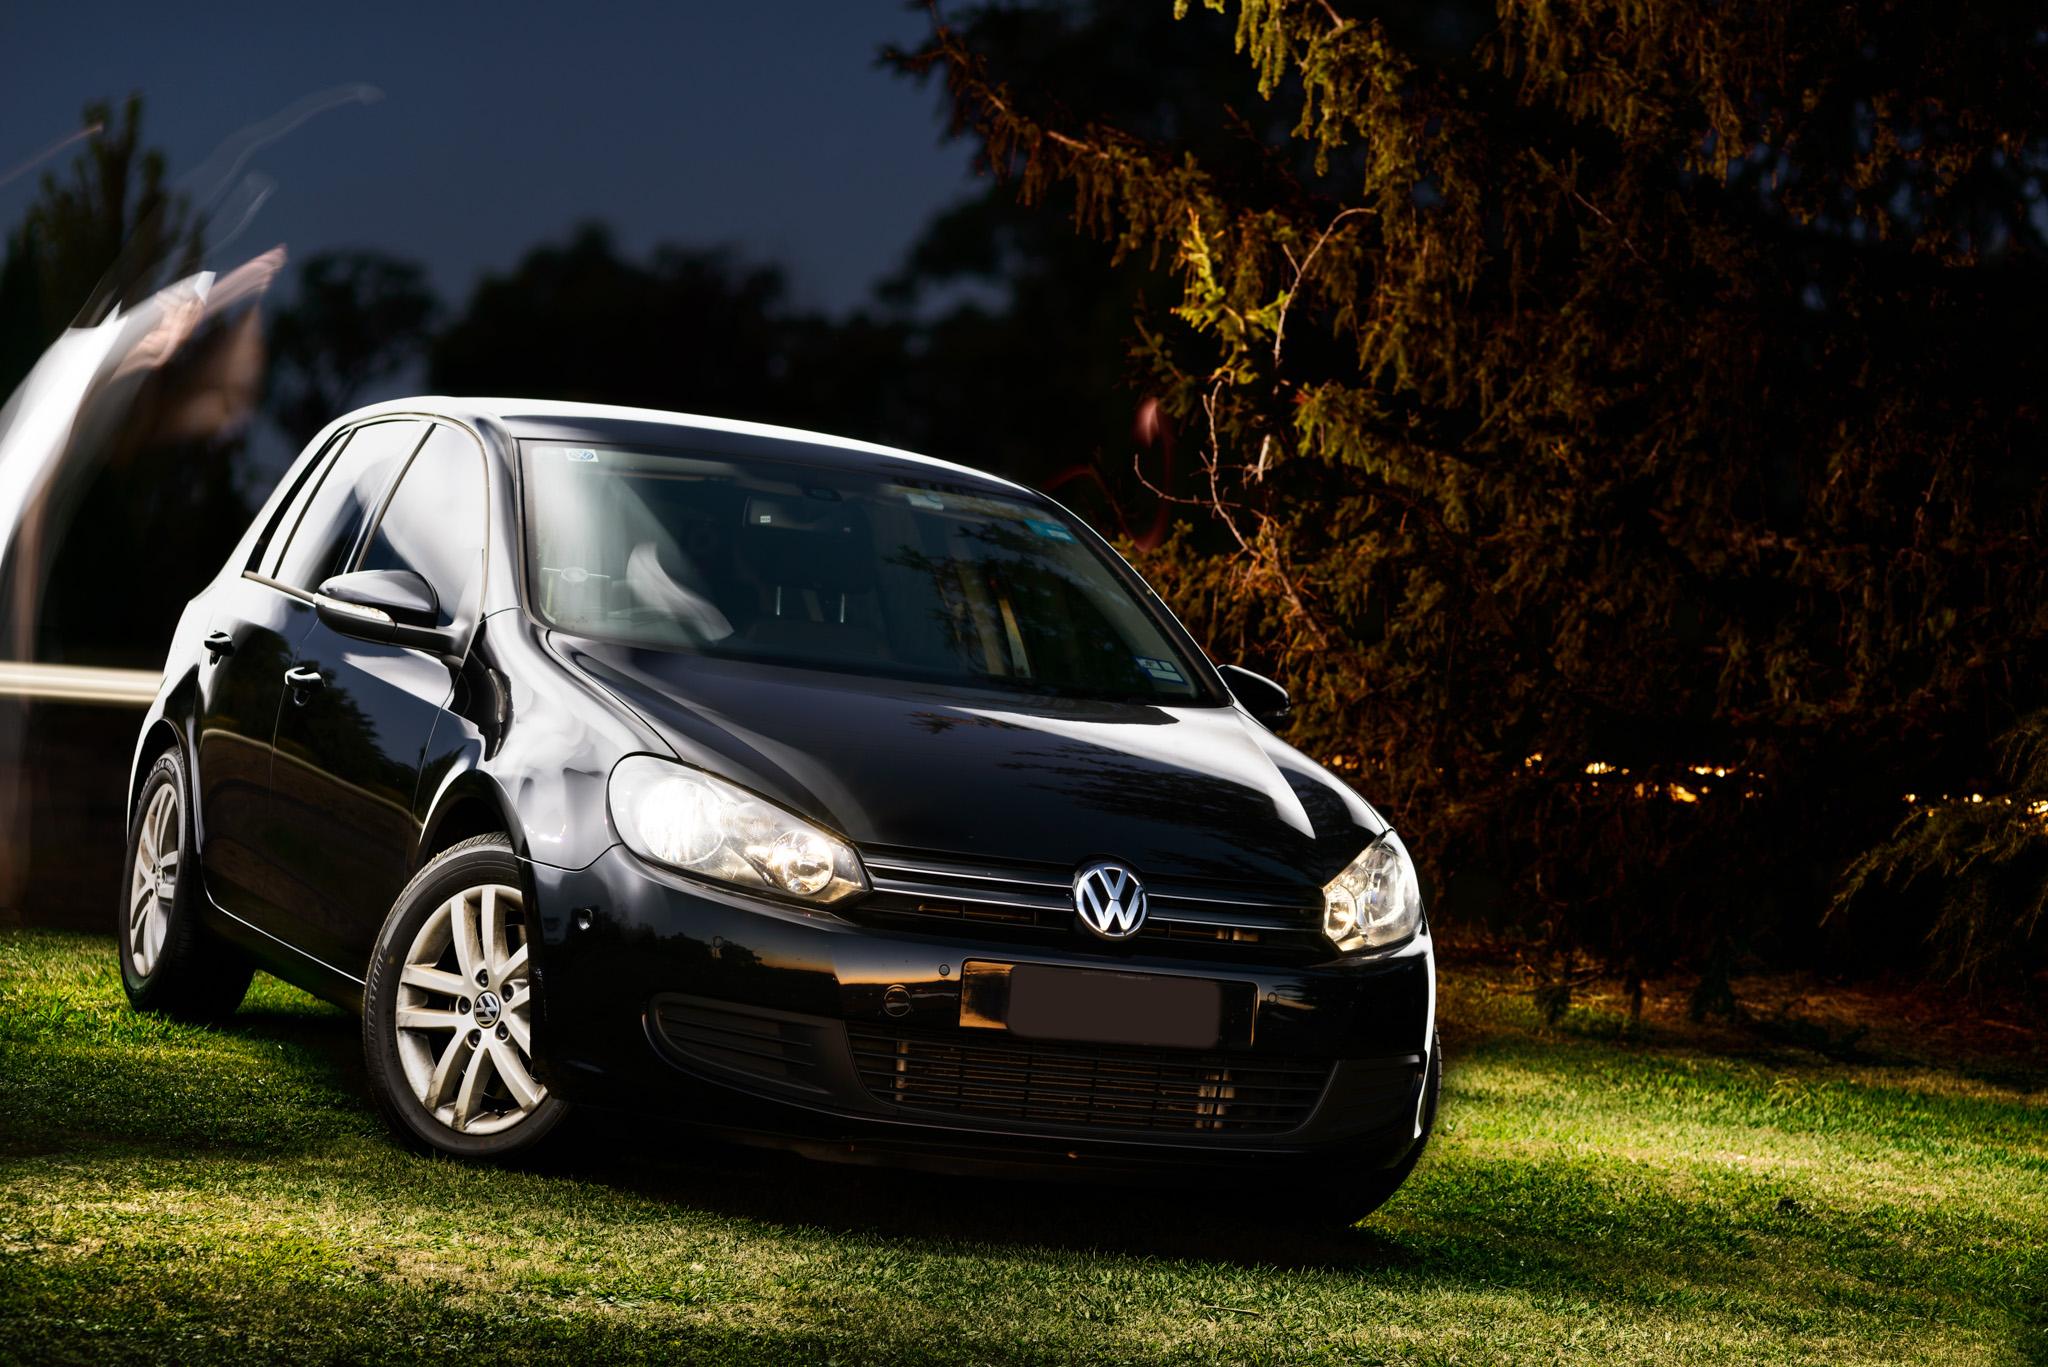 Light Painting - Volkswagen Golf Mk6 black on grass